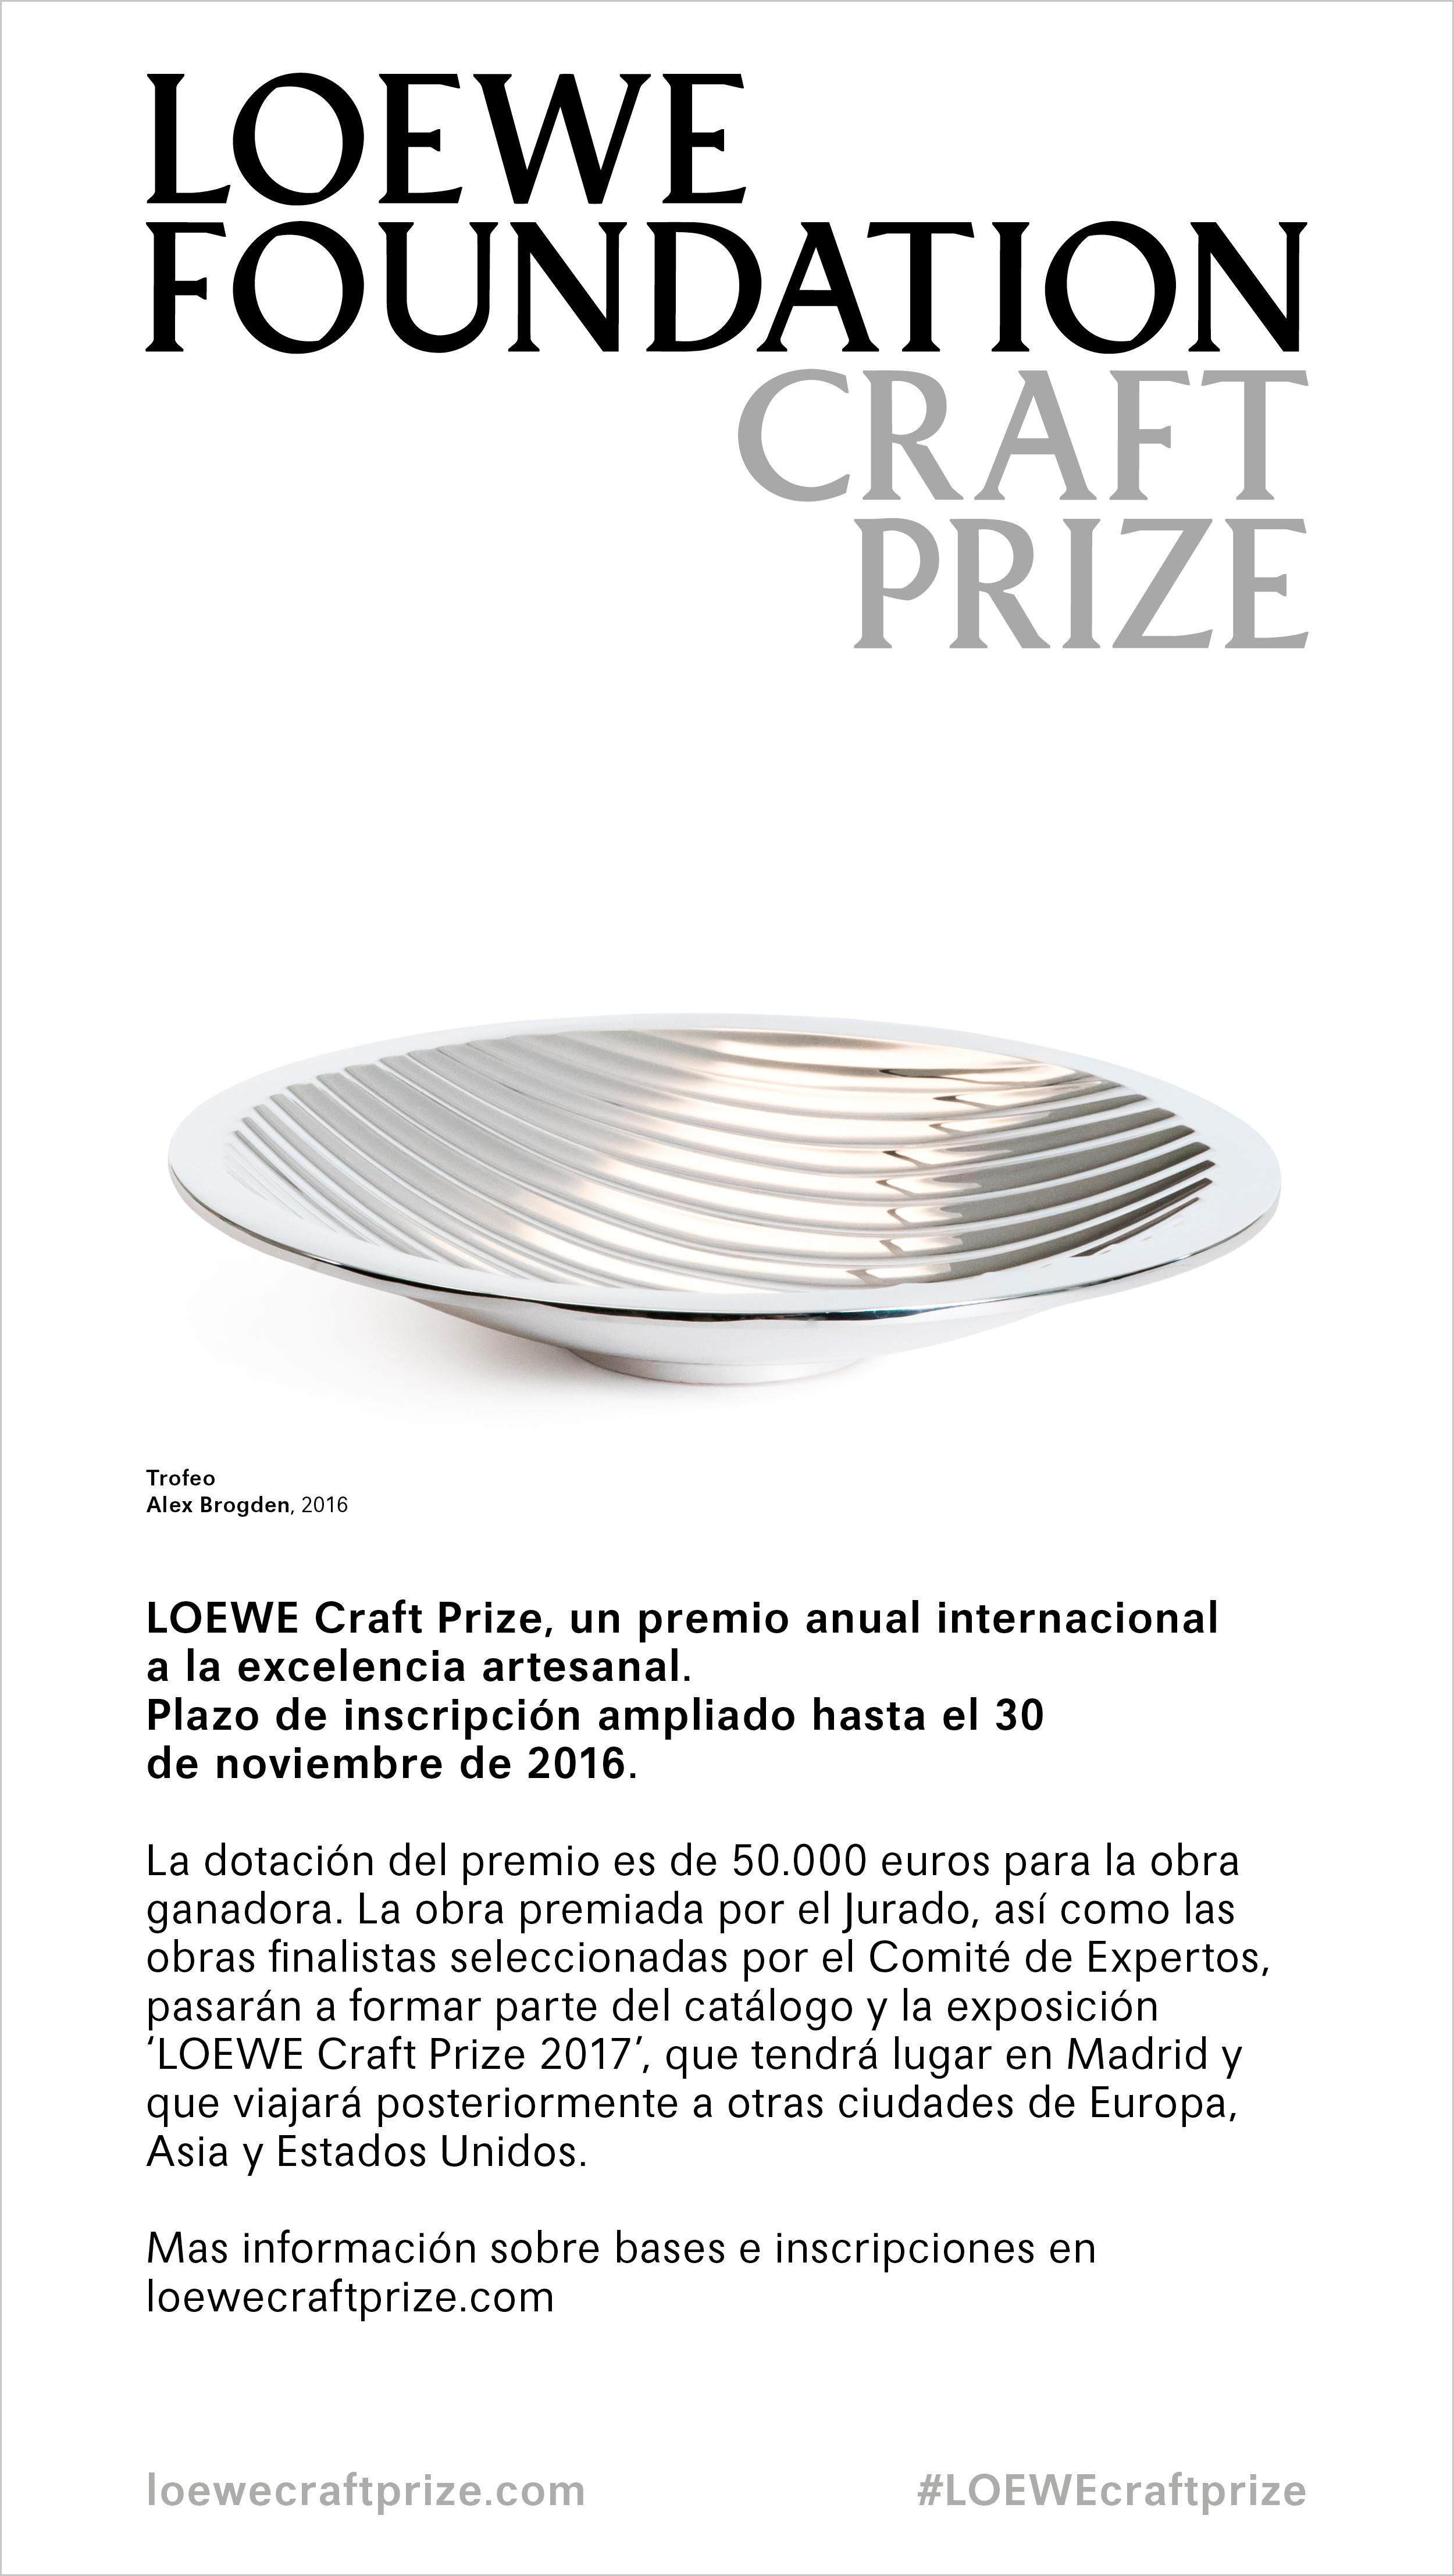 loewe-craft-prize-plazo-ampliado